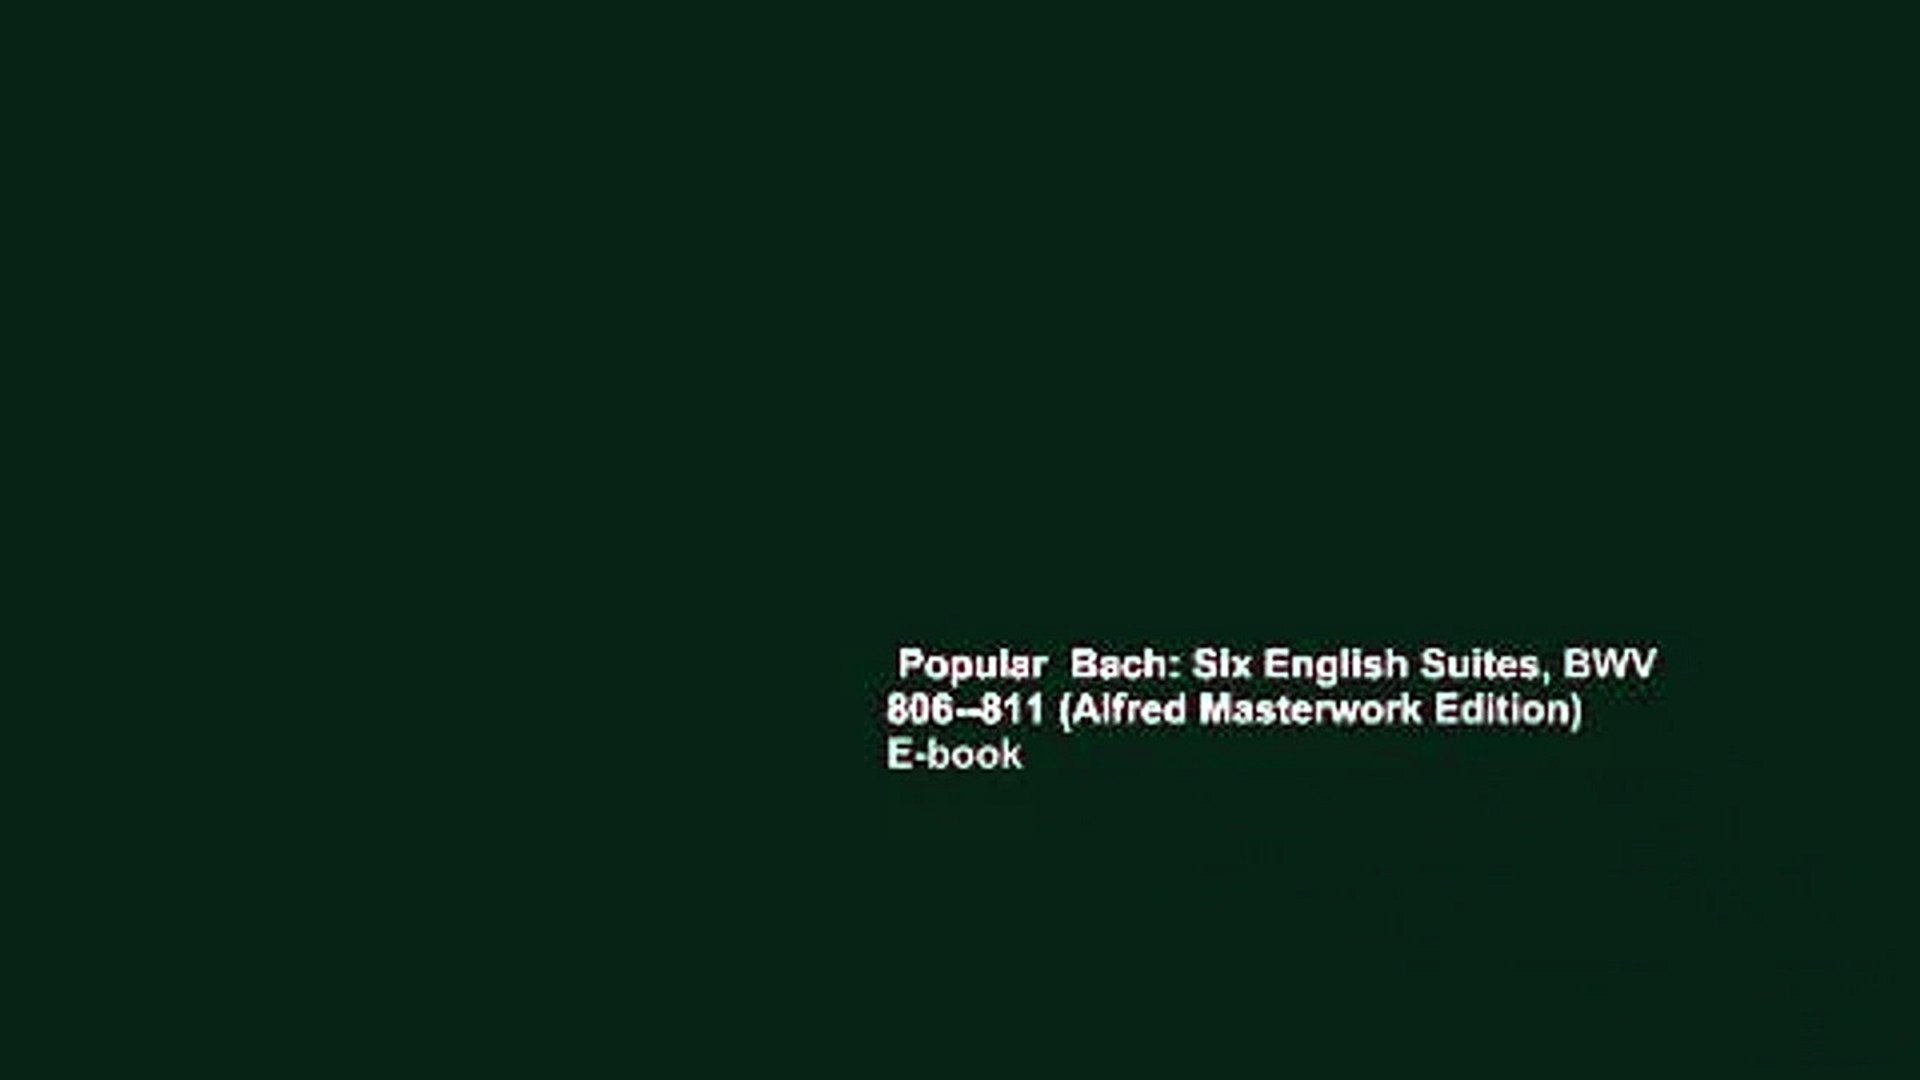 Popular  Bach: Six English Suites, BWV 806--811 (Alfred Masterwork Edition)  E-book